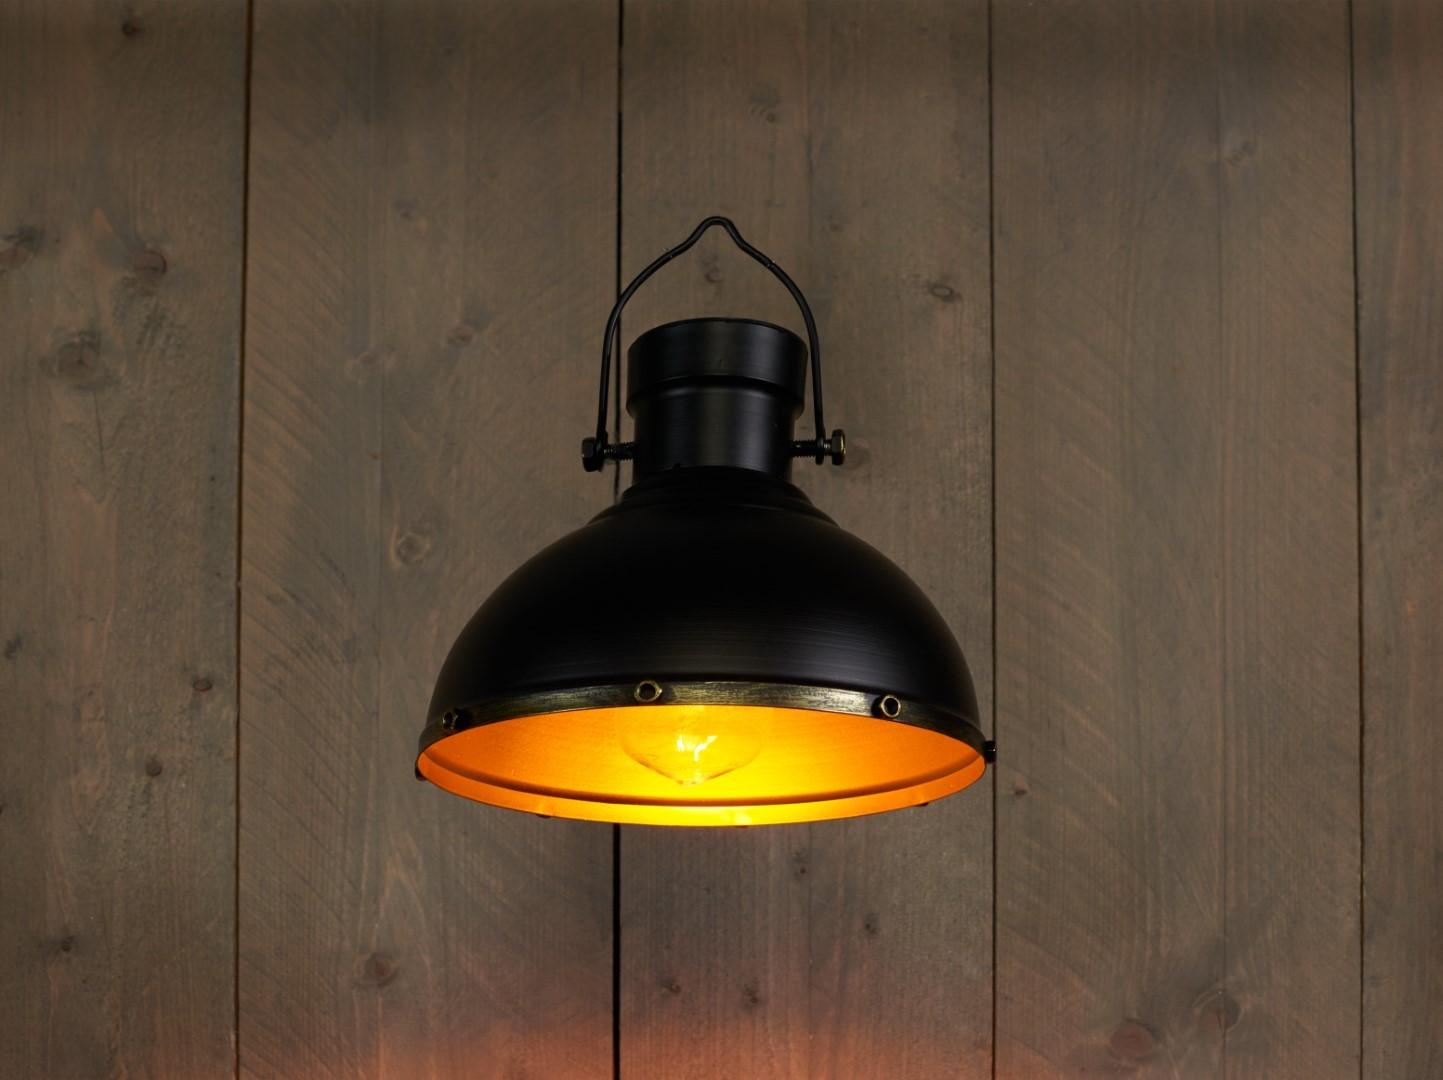 Solar retro lampenkap zwart-goud 23x23 cm